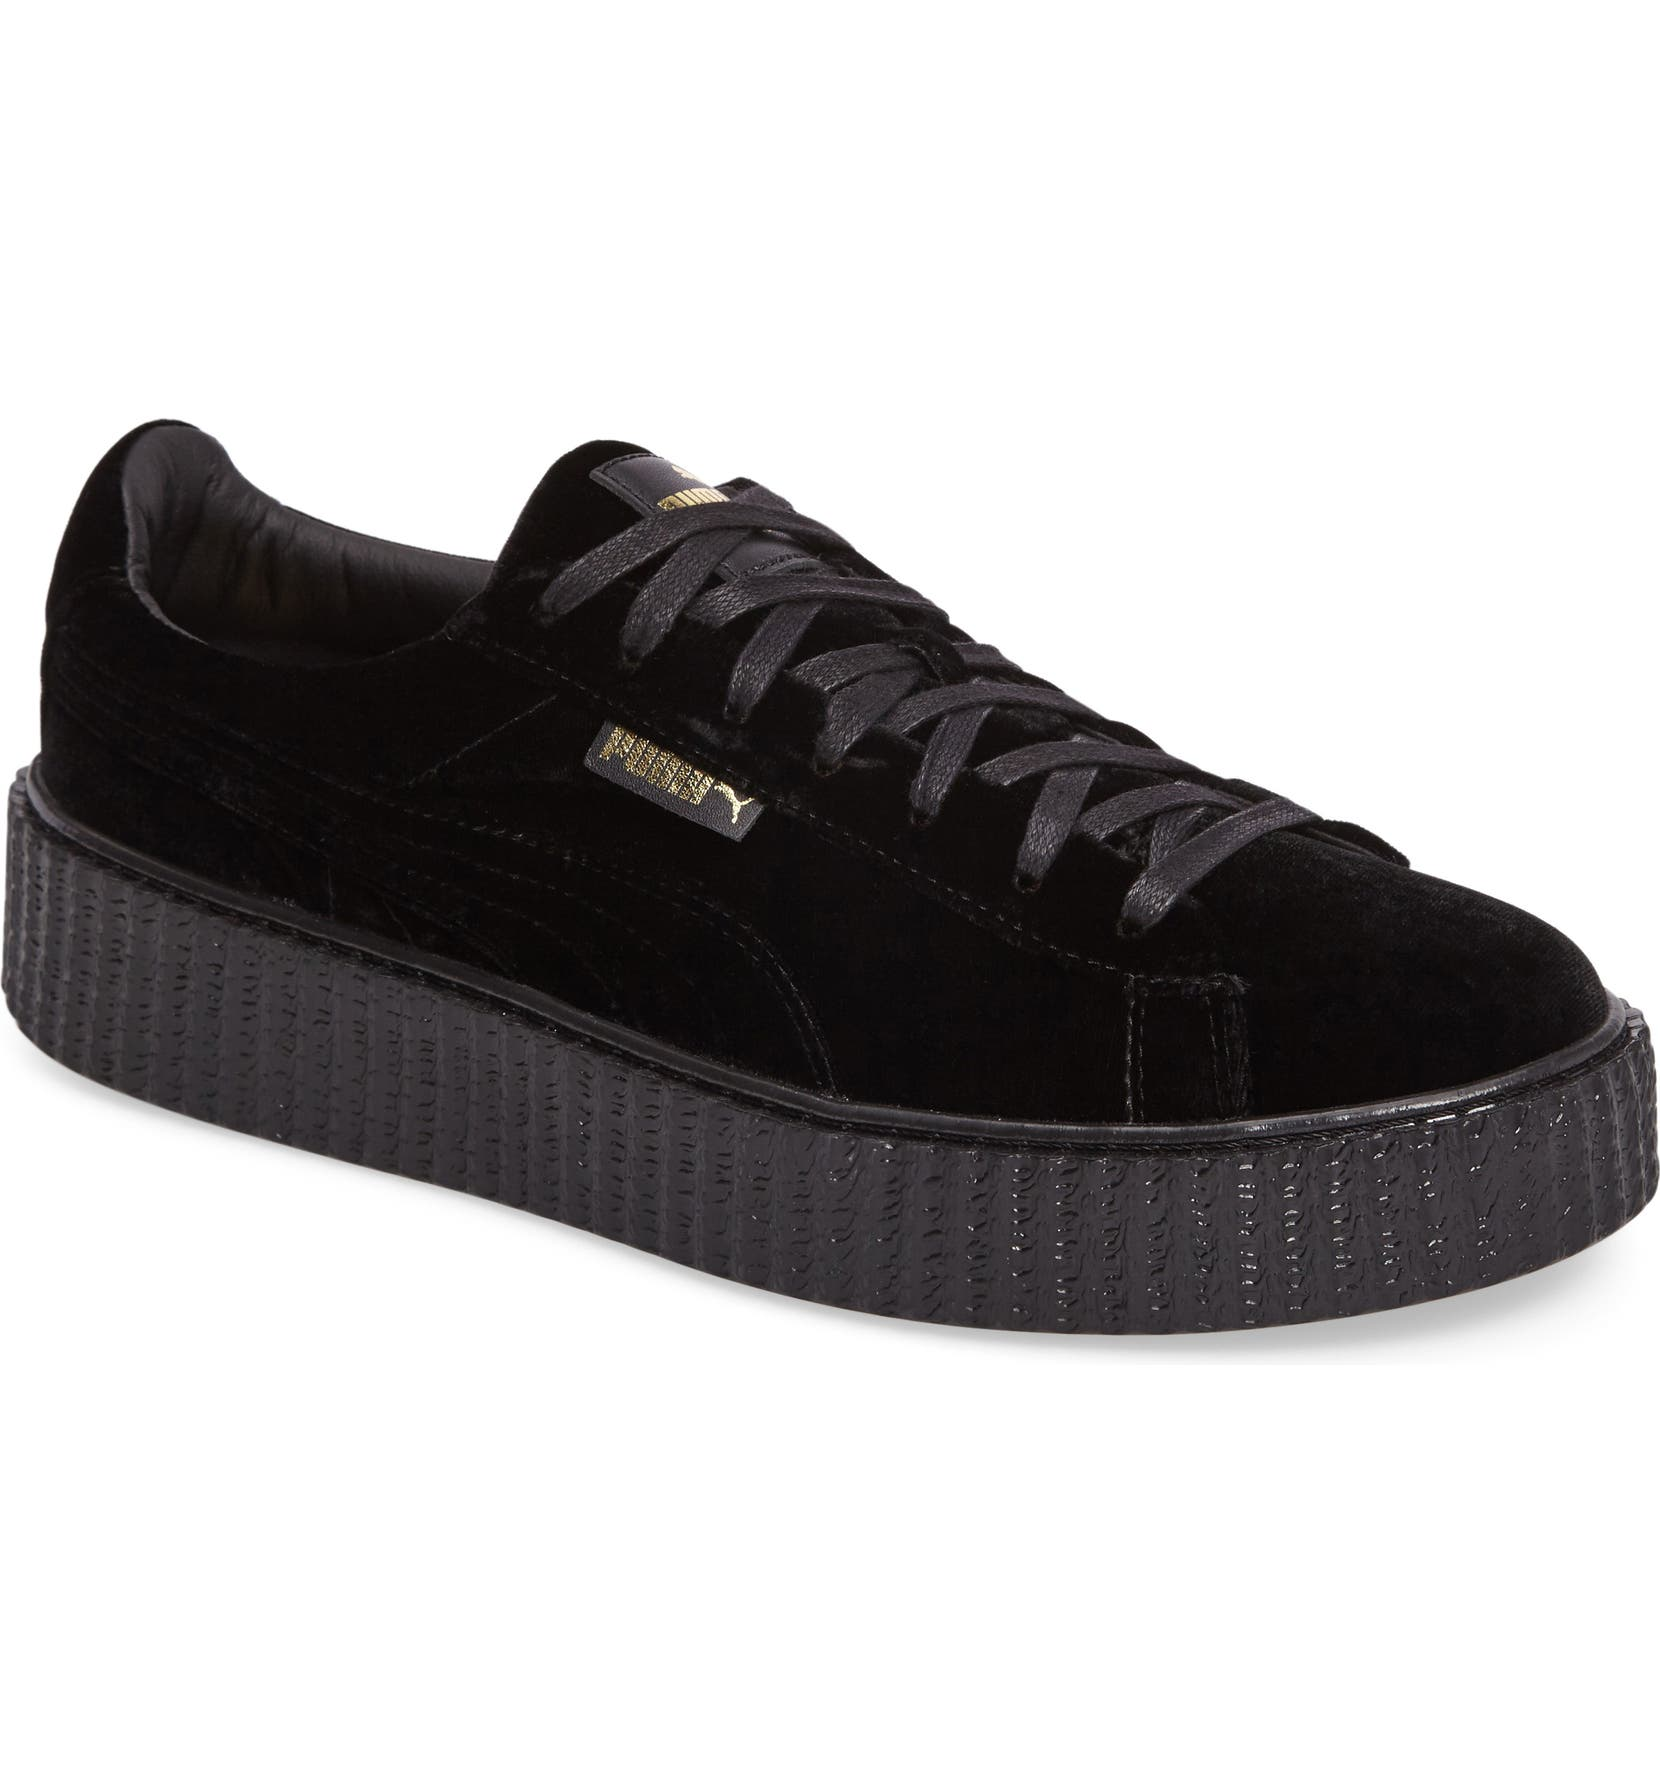 huge selection of f5bcd ba7ee FENTY PUMA by Rihanna Velvet Creeper Sneaker